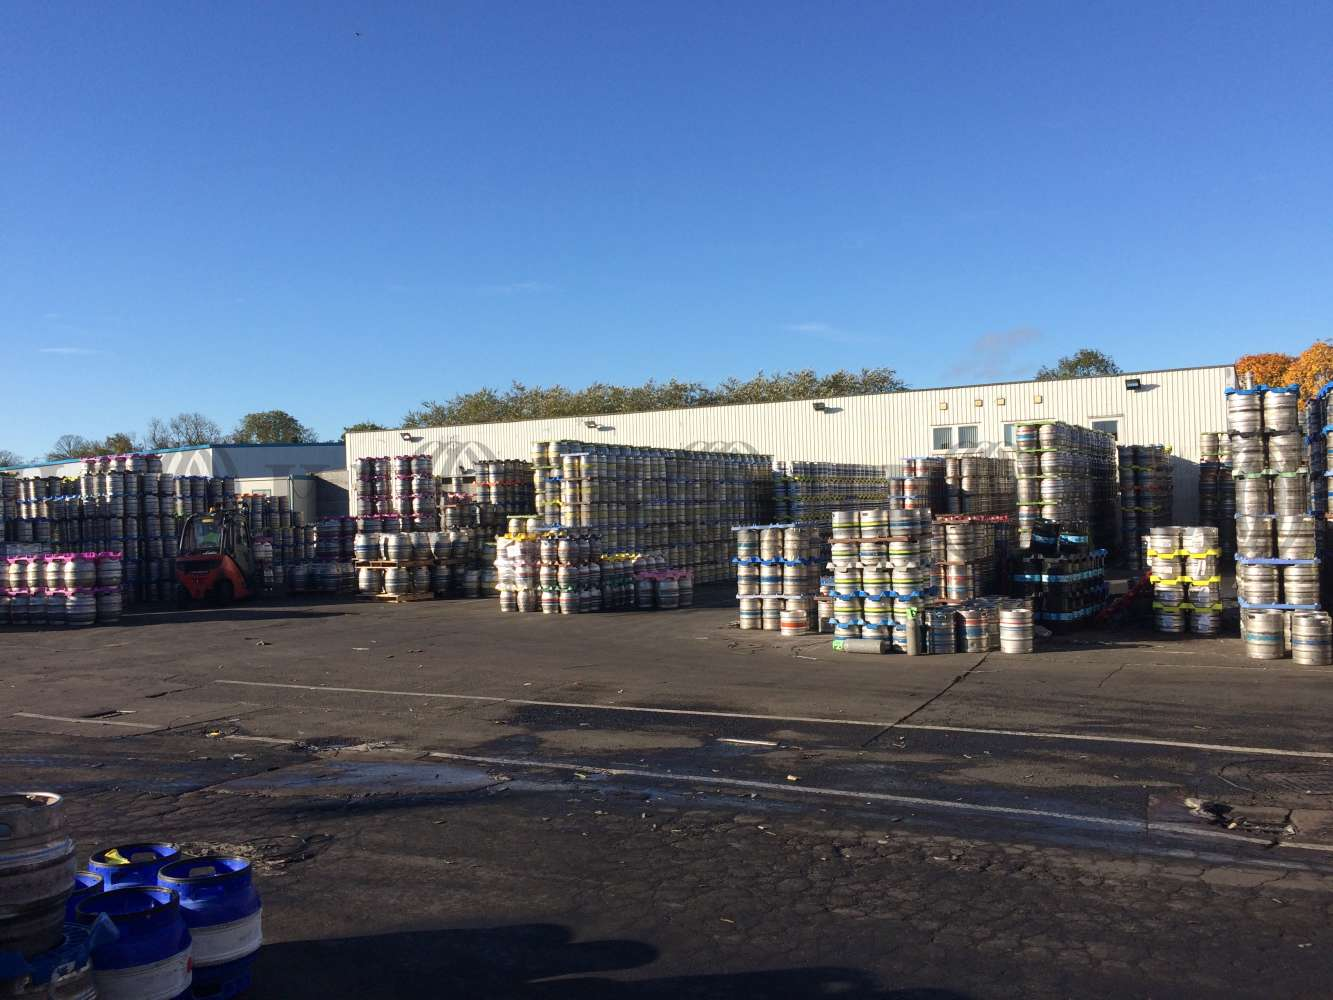 Industrial Dunbar, EH42 1RS - Belhaven Brewery Site - 0131